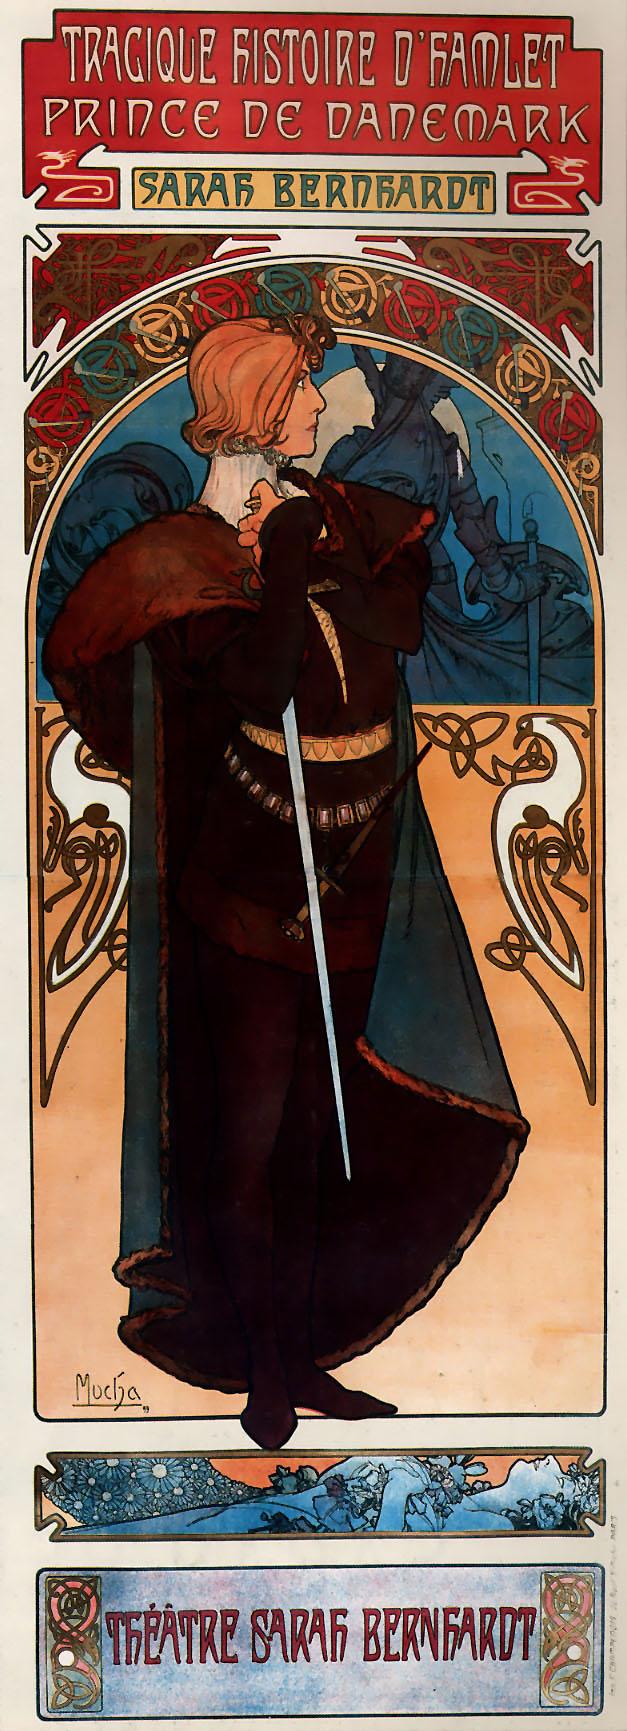 Рекламный плакат для Сары Бернар. Гамлет-1899